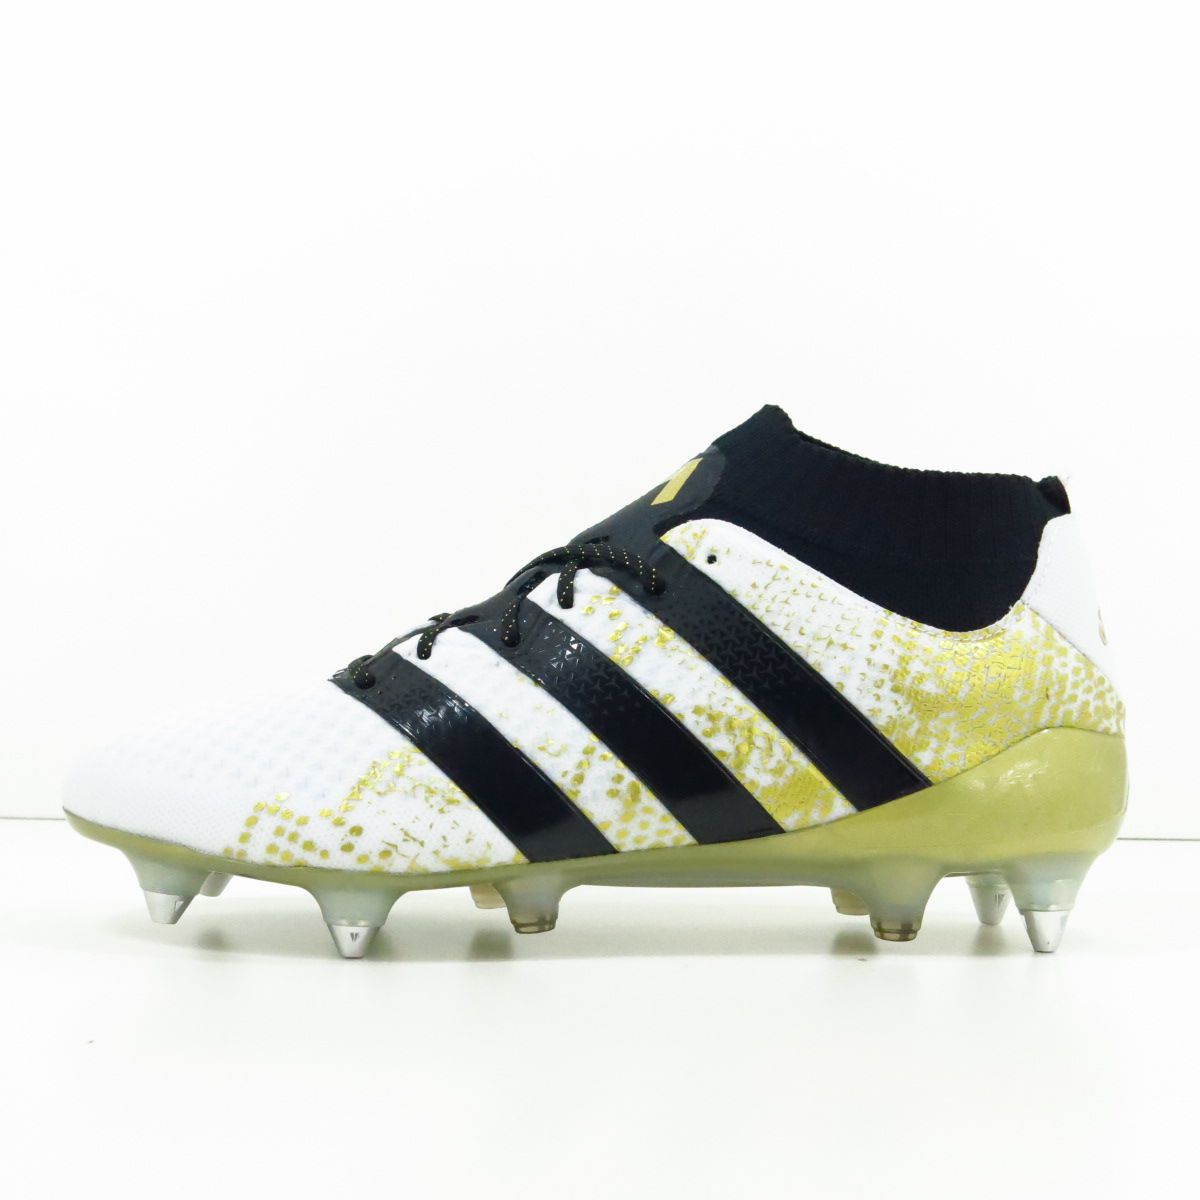 Chuteira Adidas Ace 16.1 SG Elite - Trava Mista